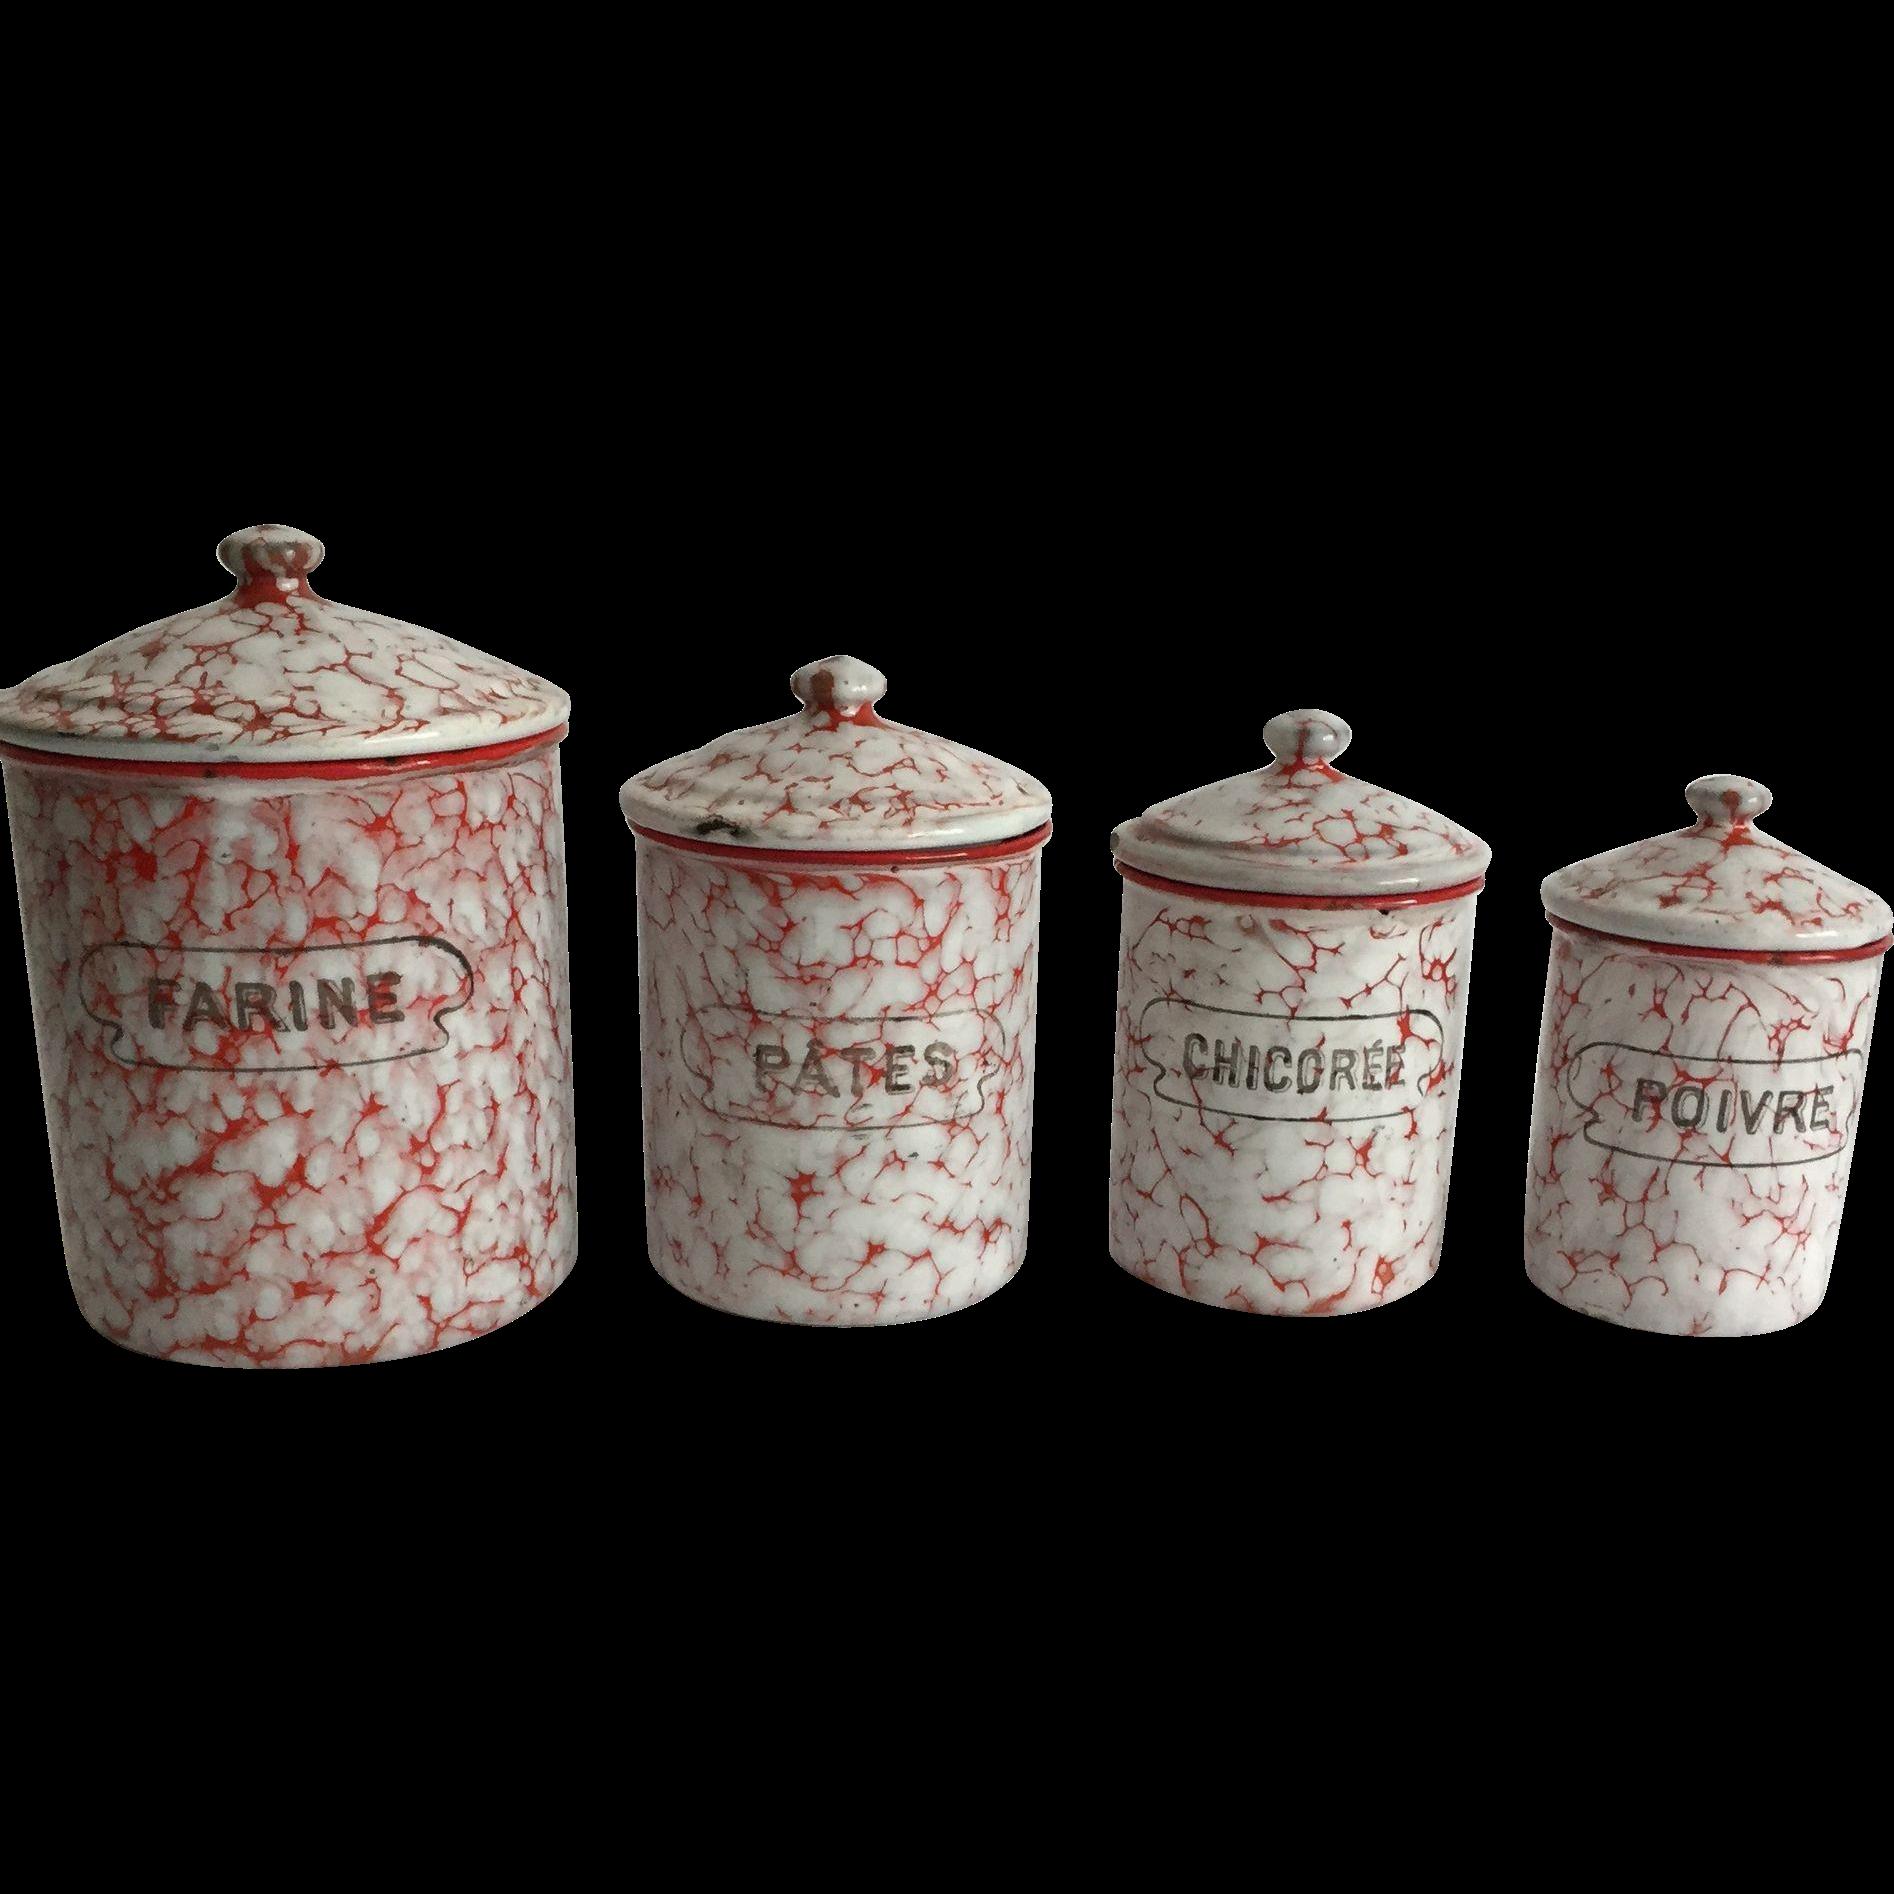 French Enamel/Granite Ware Canister Set